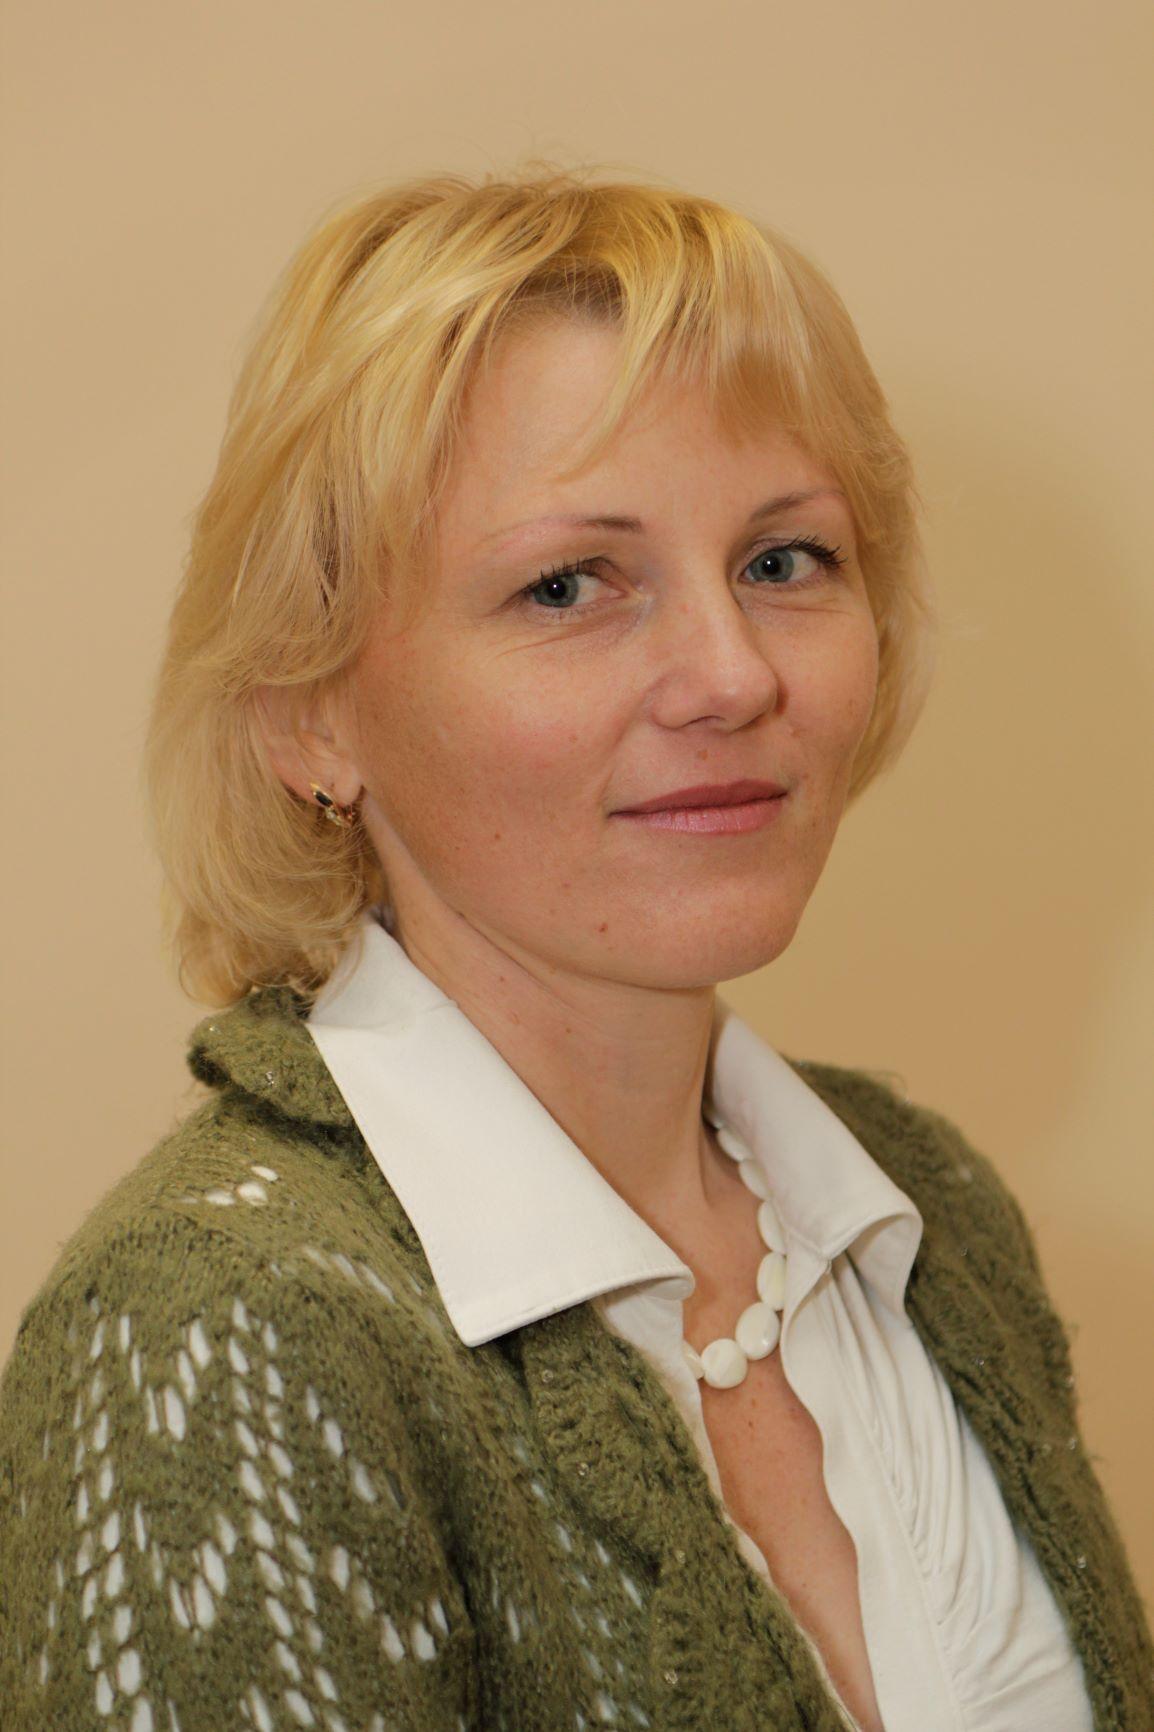 Шишко Елена Ивановна